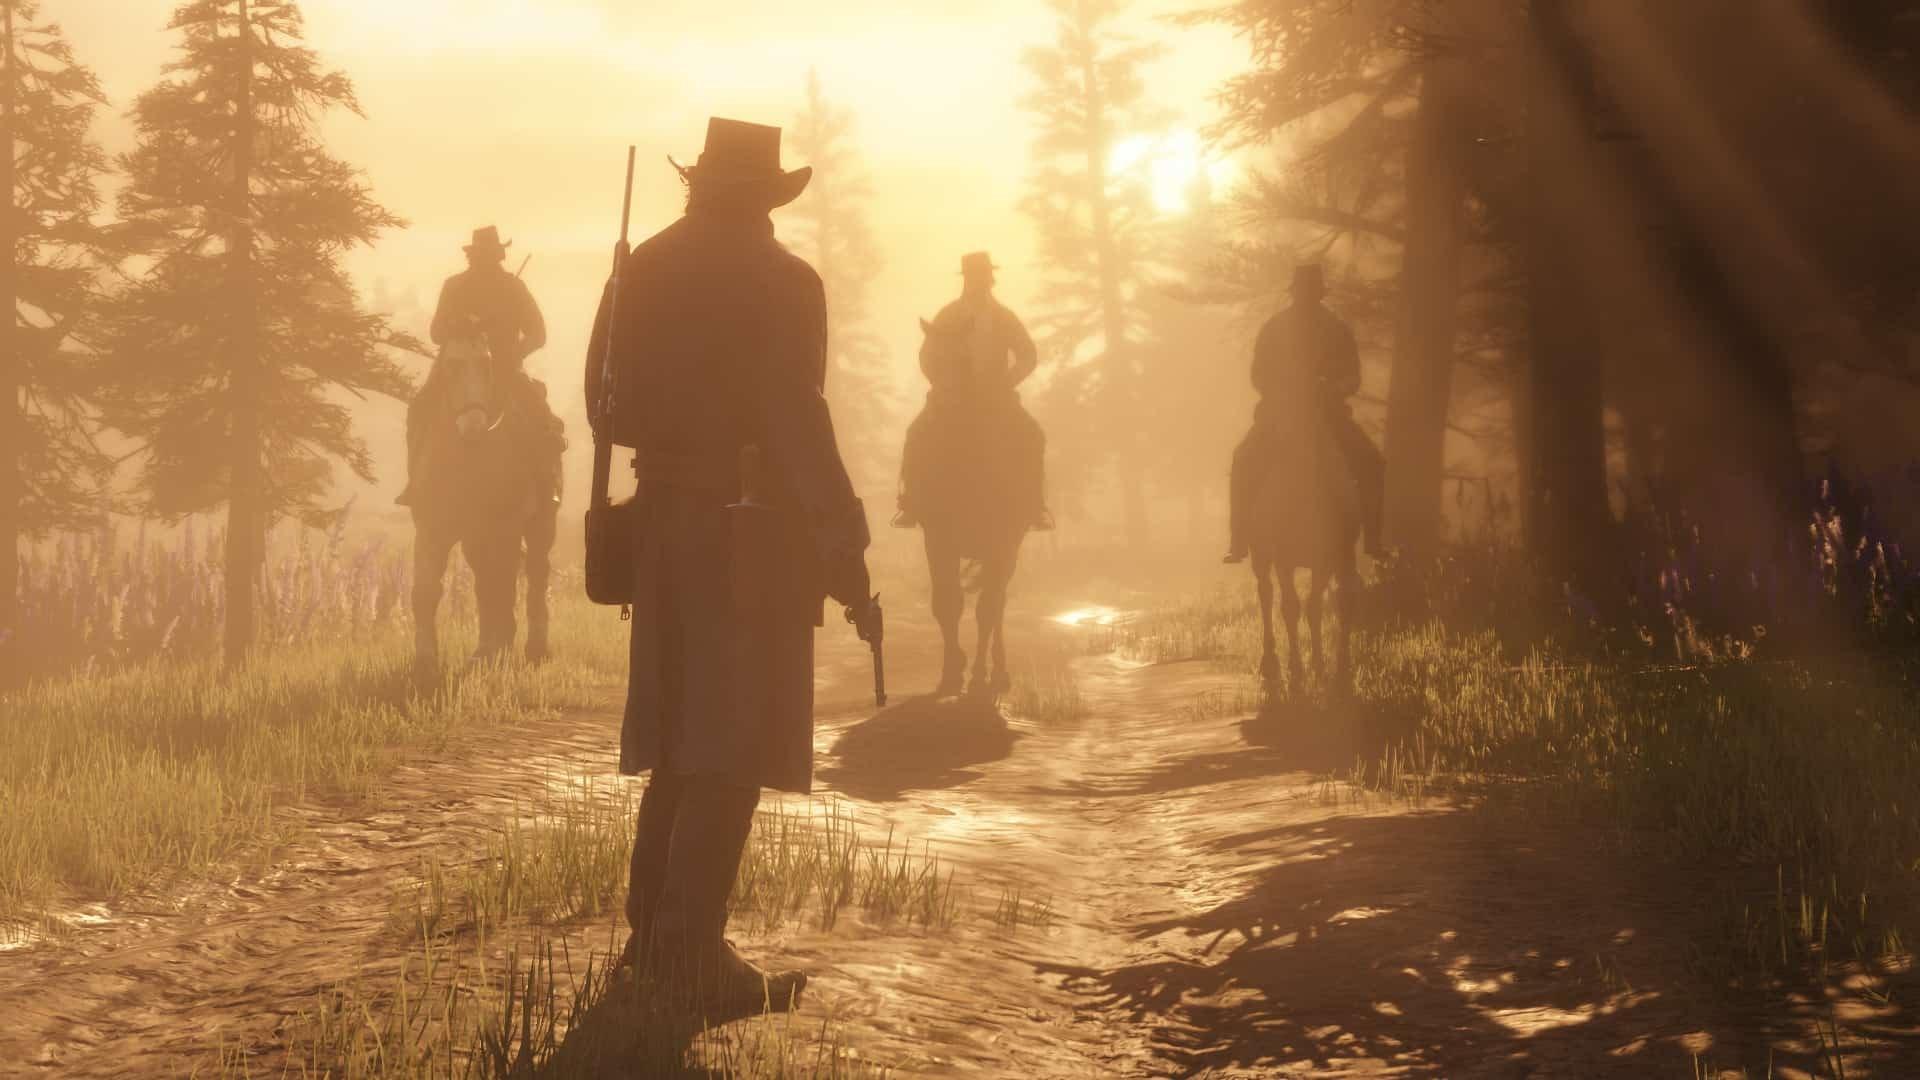 Rockstar Games назвали дату запуска мультиплеера для Red Dead Redemption 2